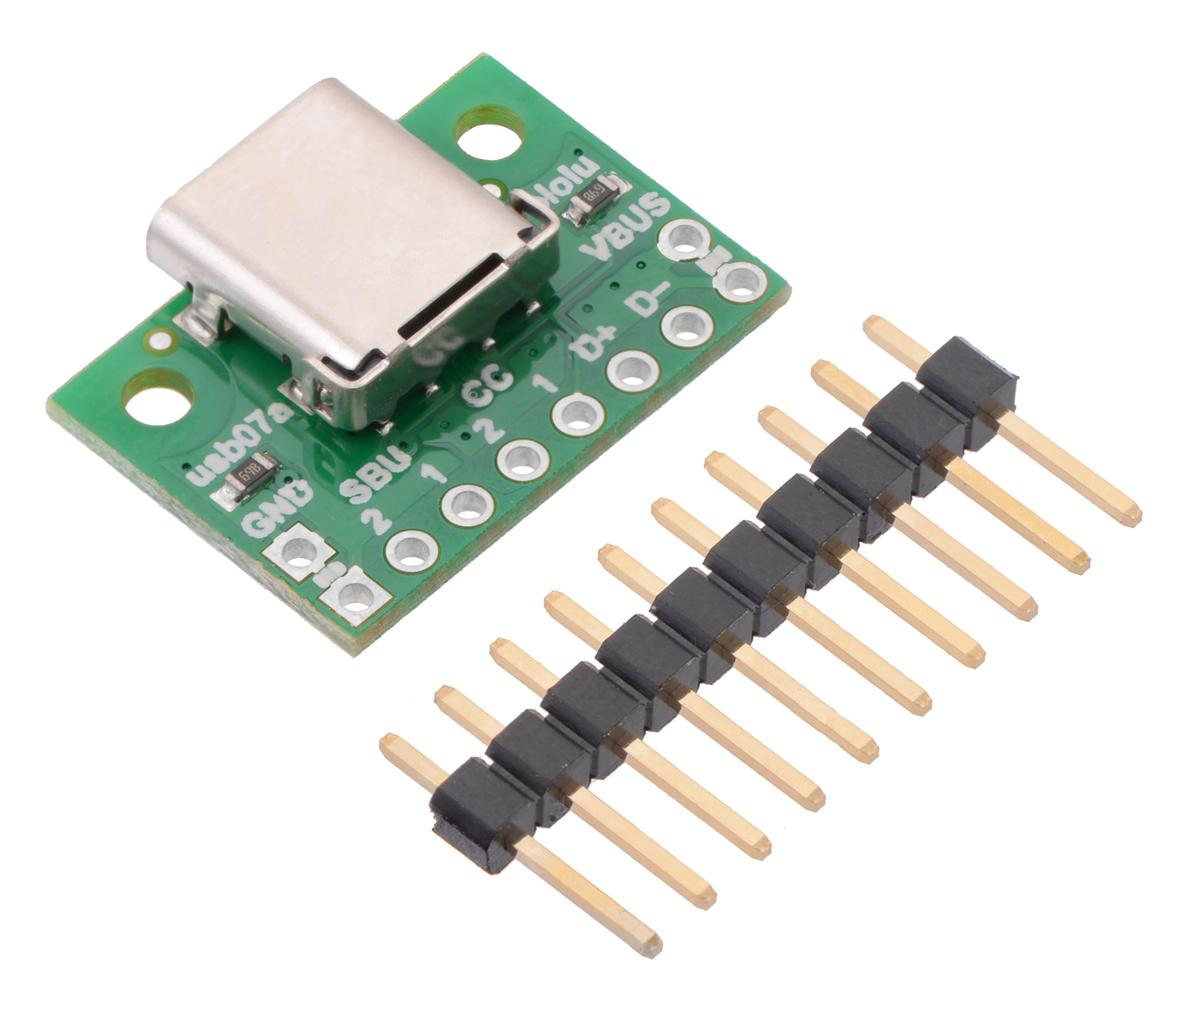 usb 2 0 type c connector breakout board [ 1200 x 1010 Pixel ]